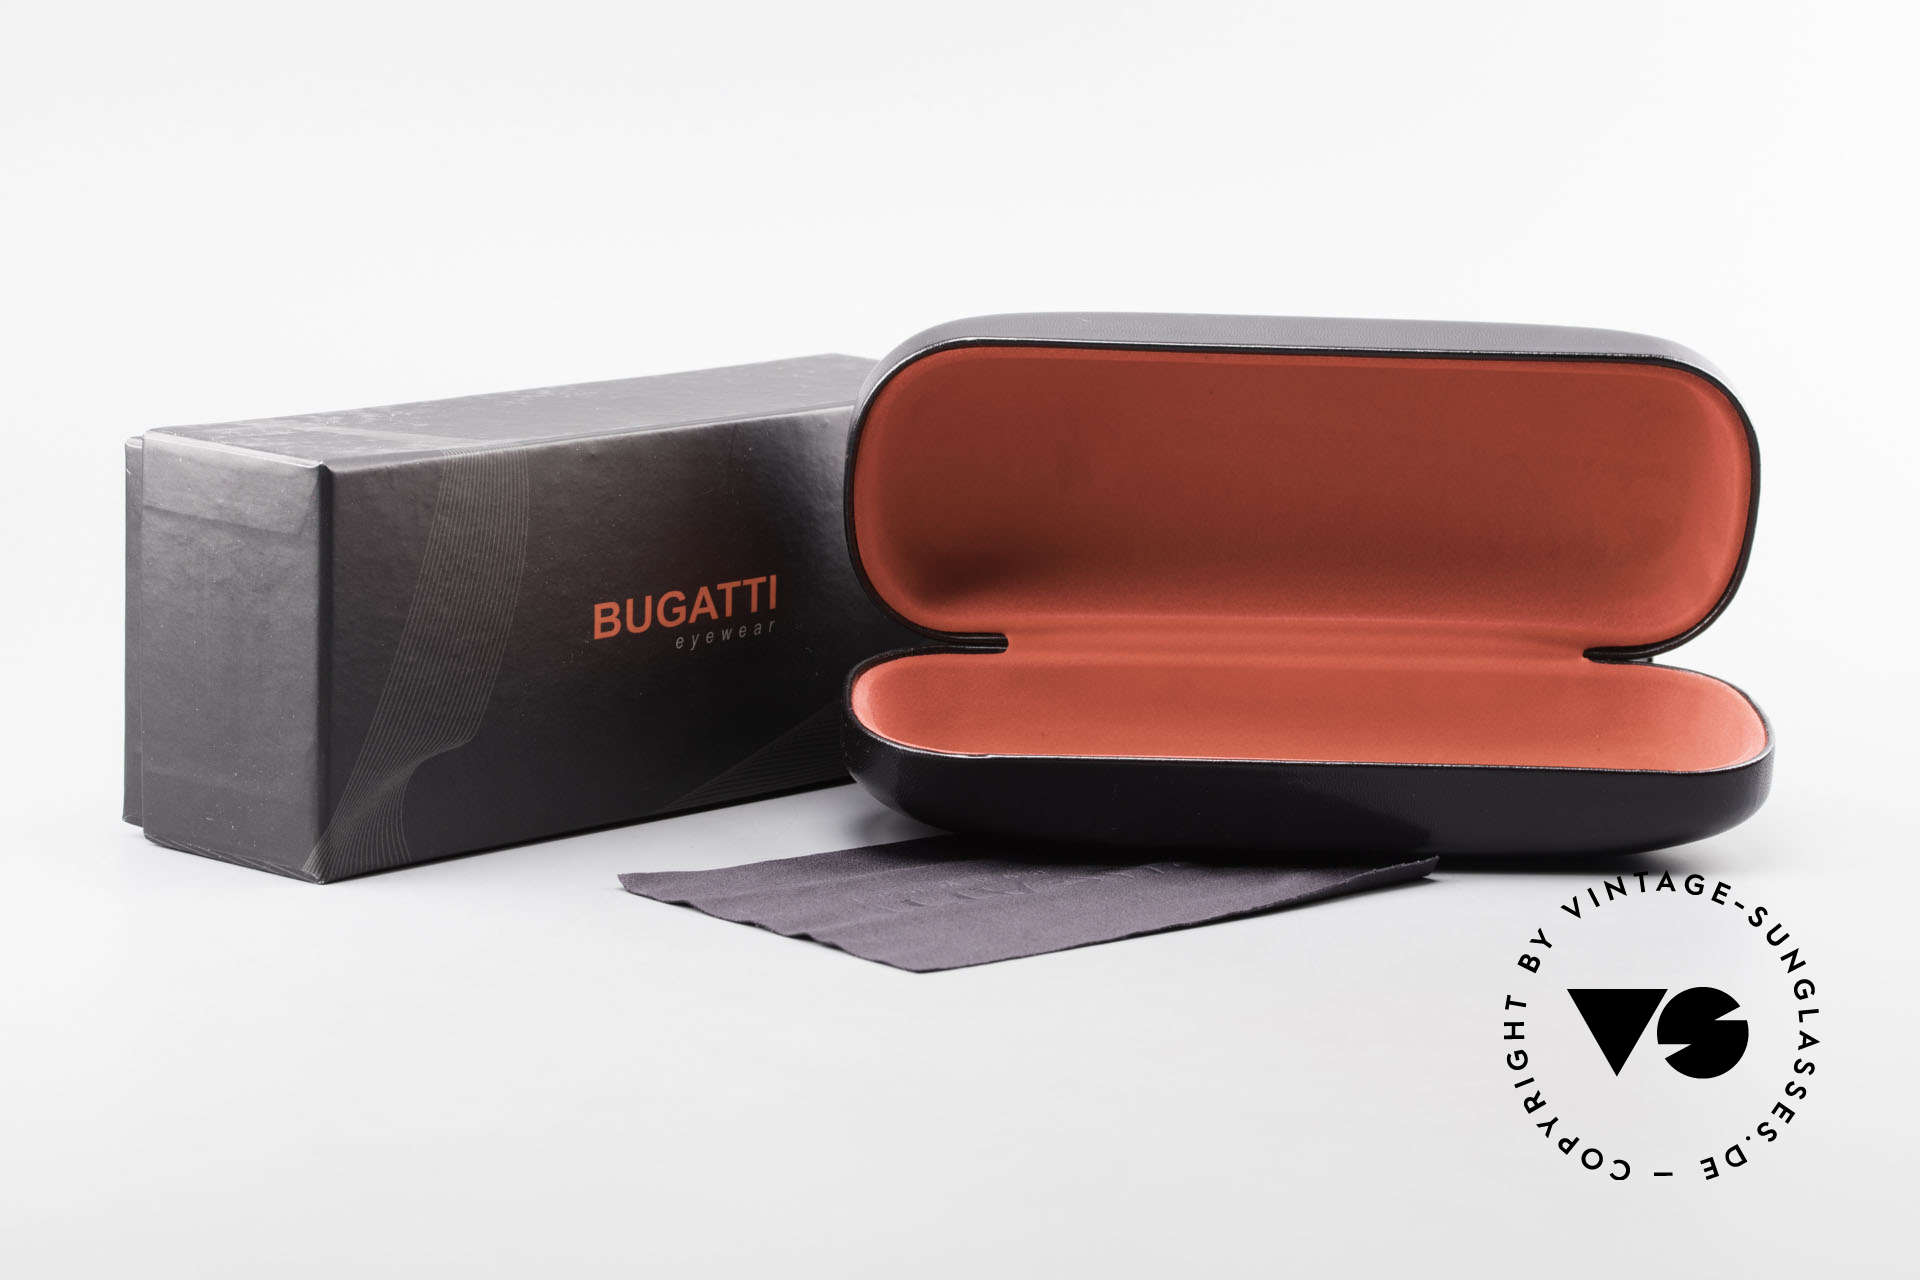 Bugatti 531 Ebony Titanium Eyeglass-Frame, Size: medium, Made for Men